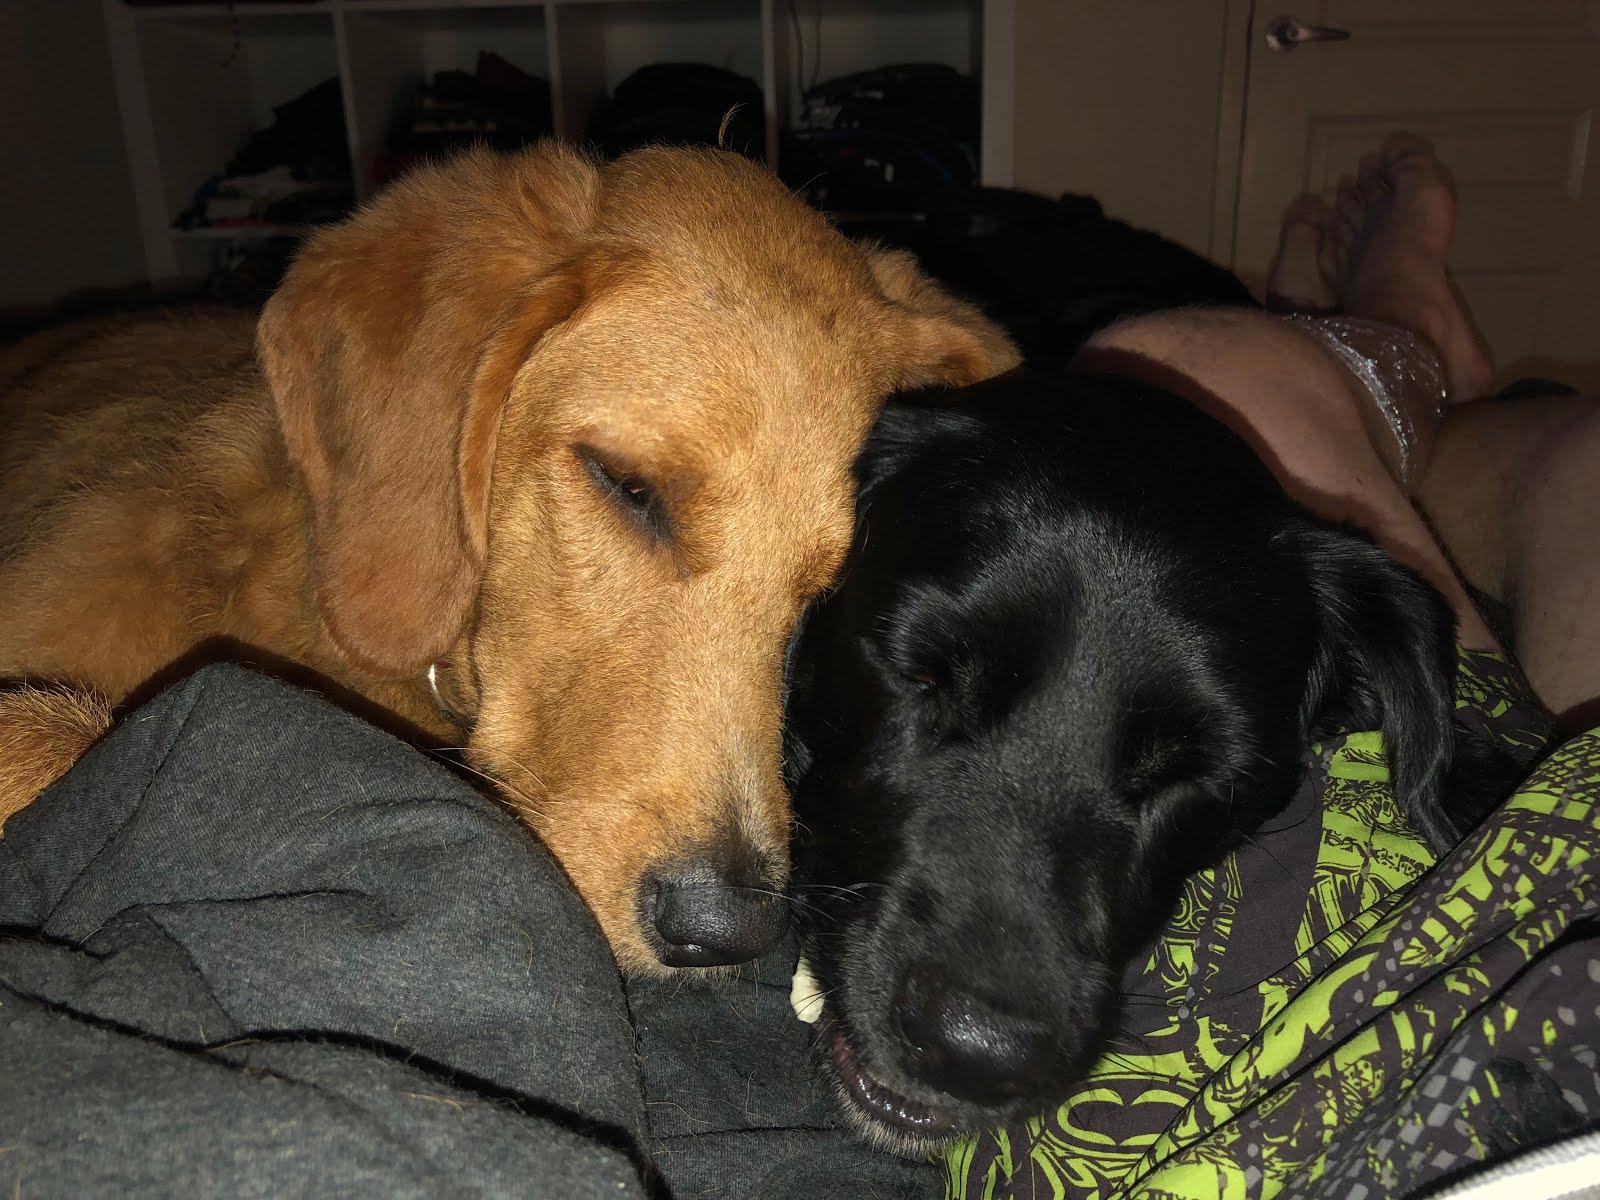 Brooklyn and Harley (the fur babies)